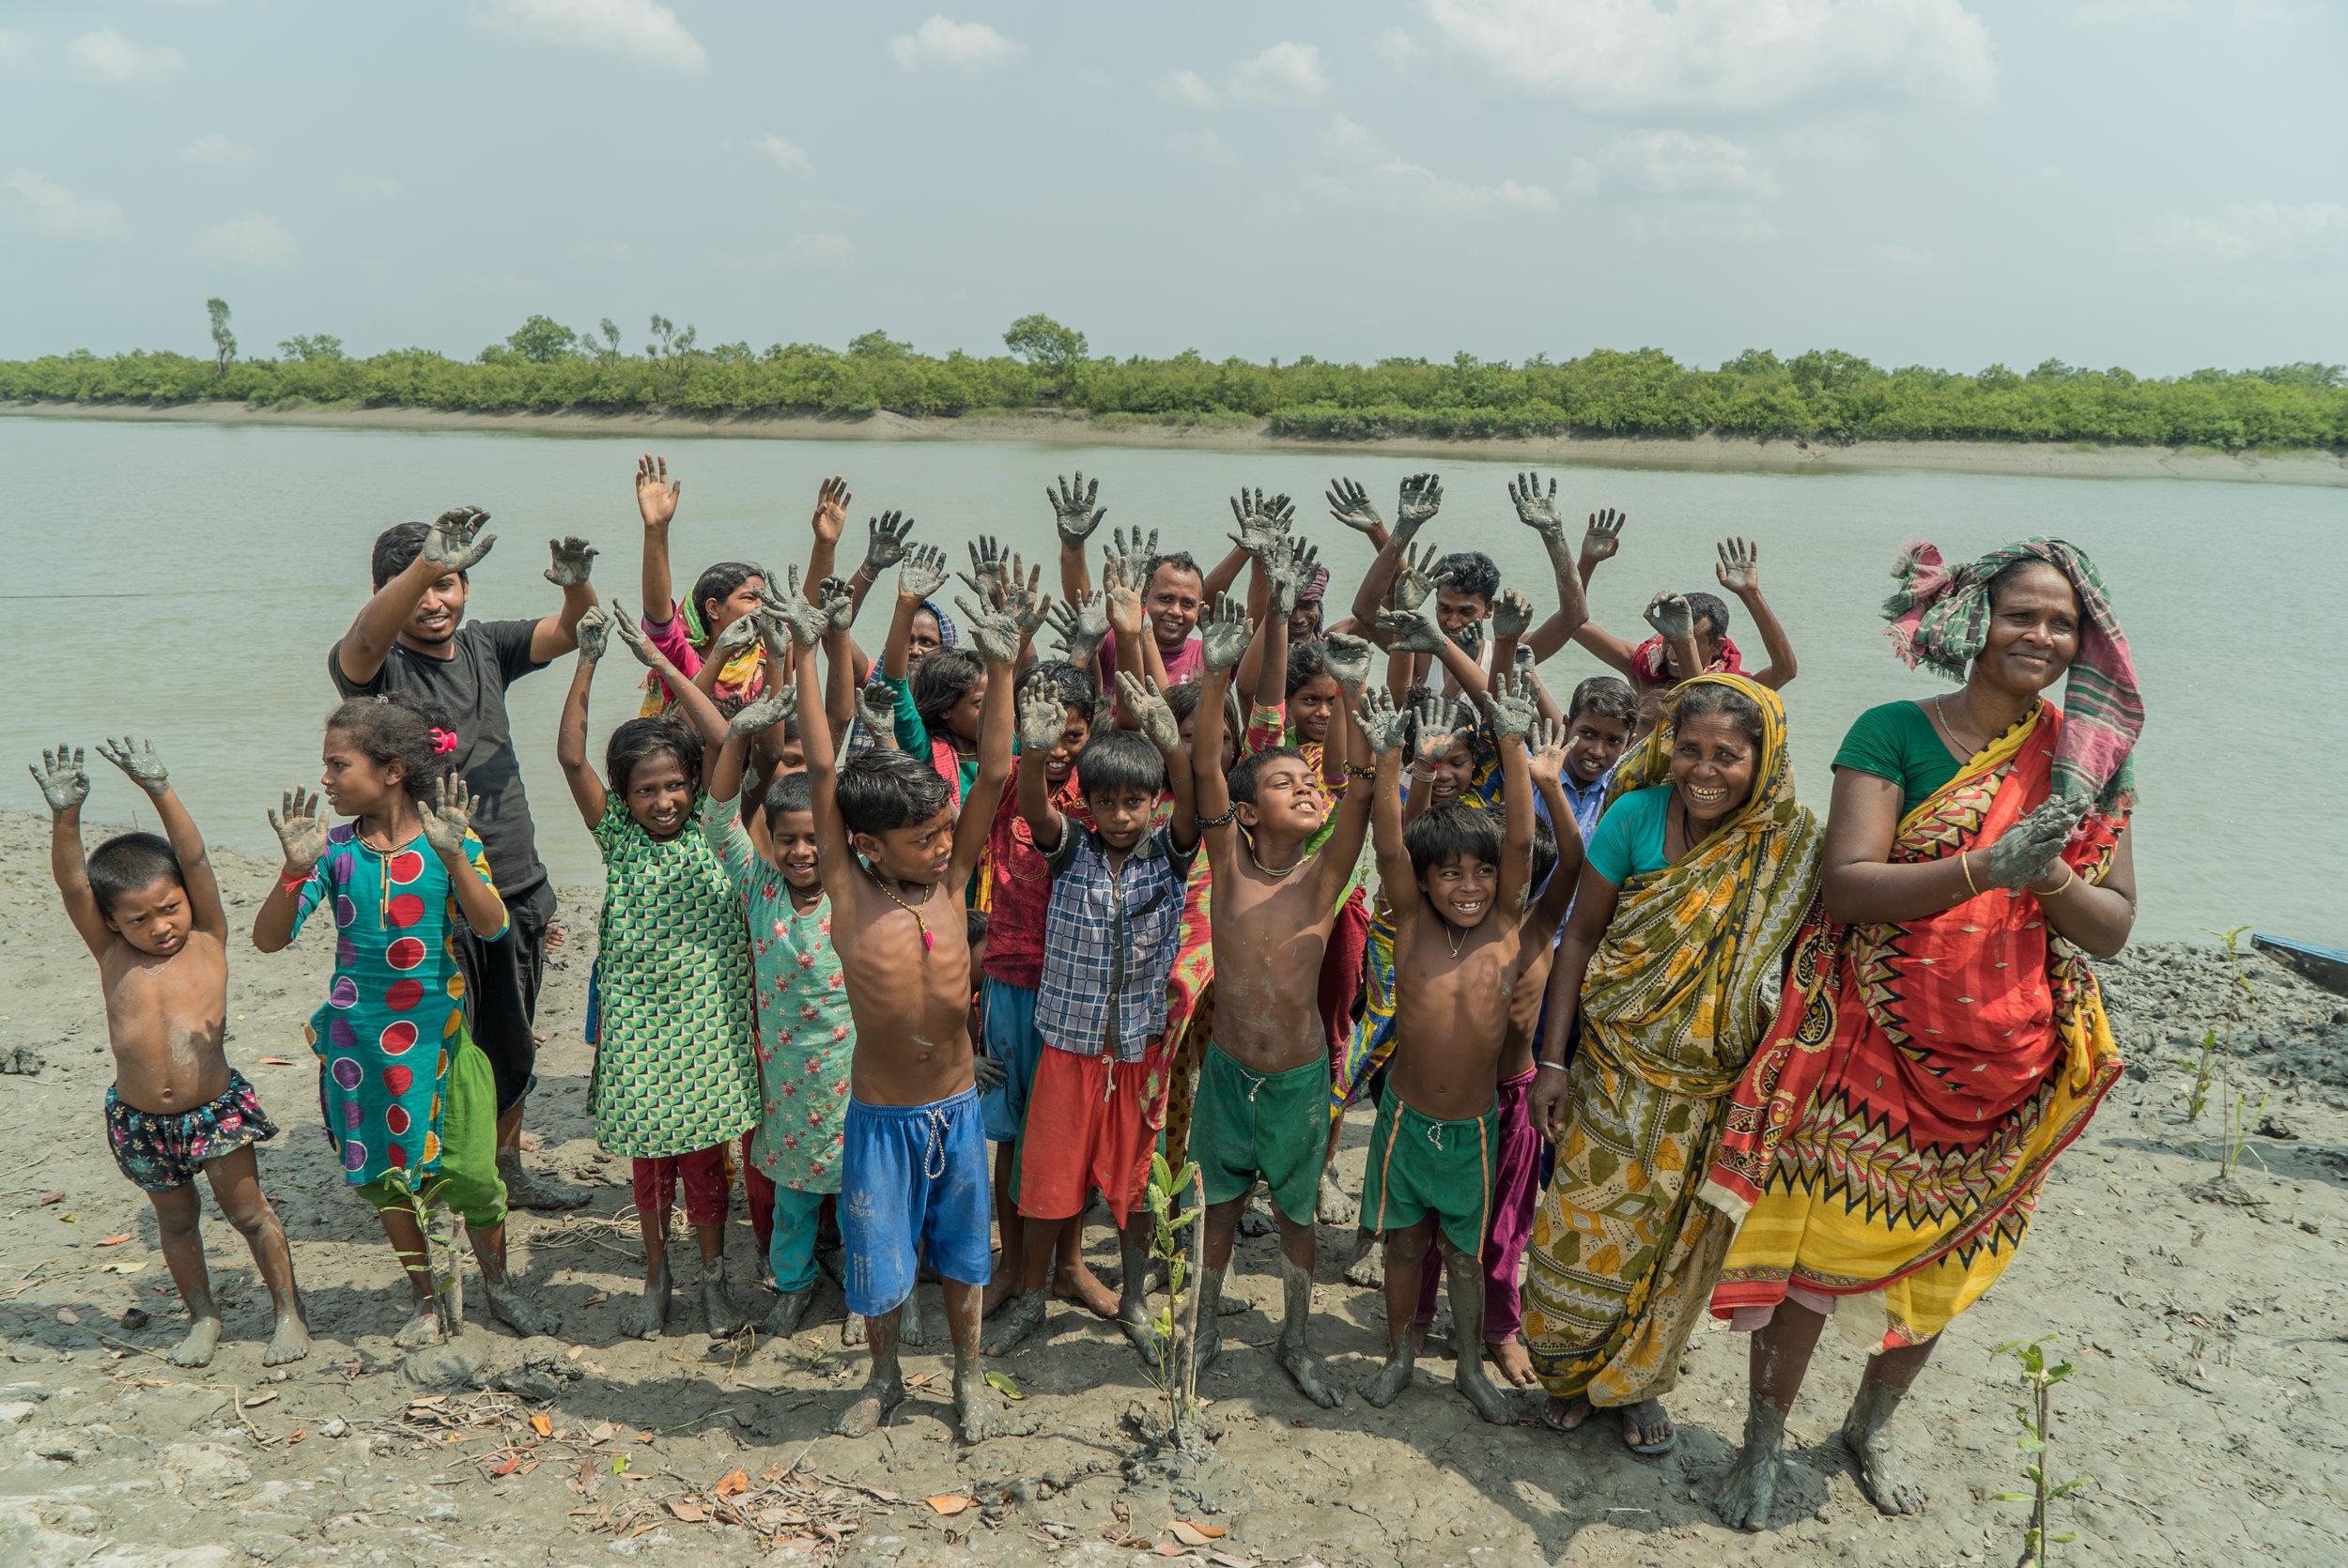 bangladesh-cyclone-shelter-mangrove-planting-sundurbans-Photo-by-Aaron-Minks-DSC05627.jpg